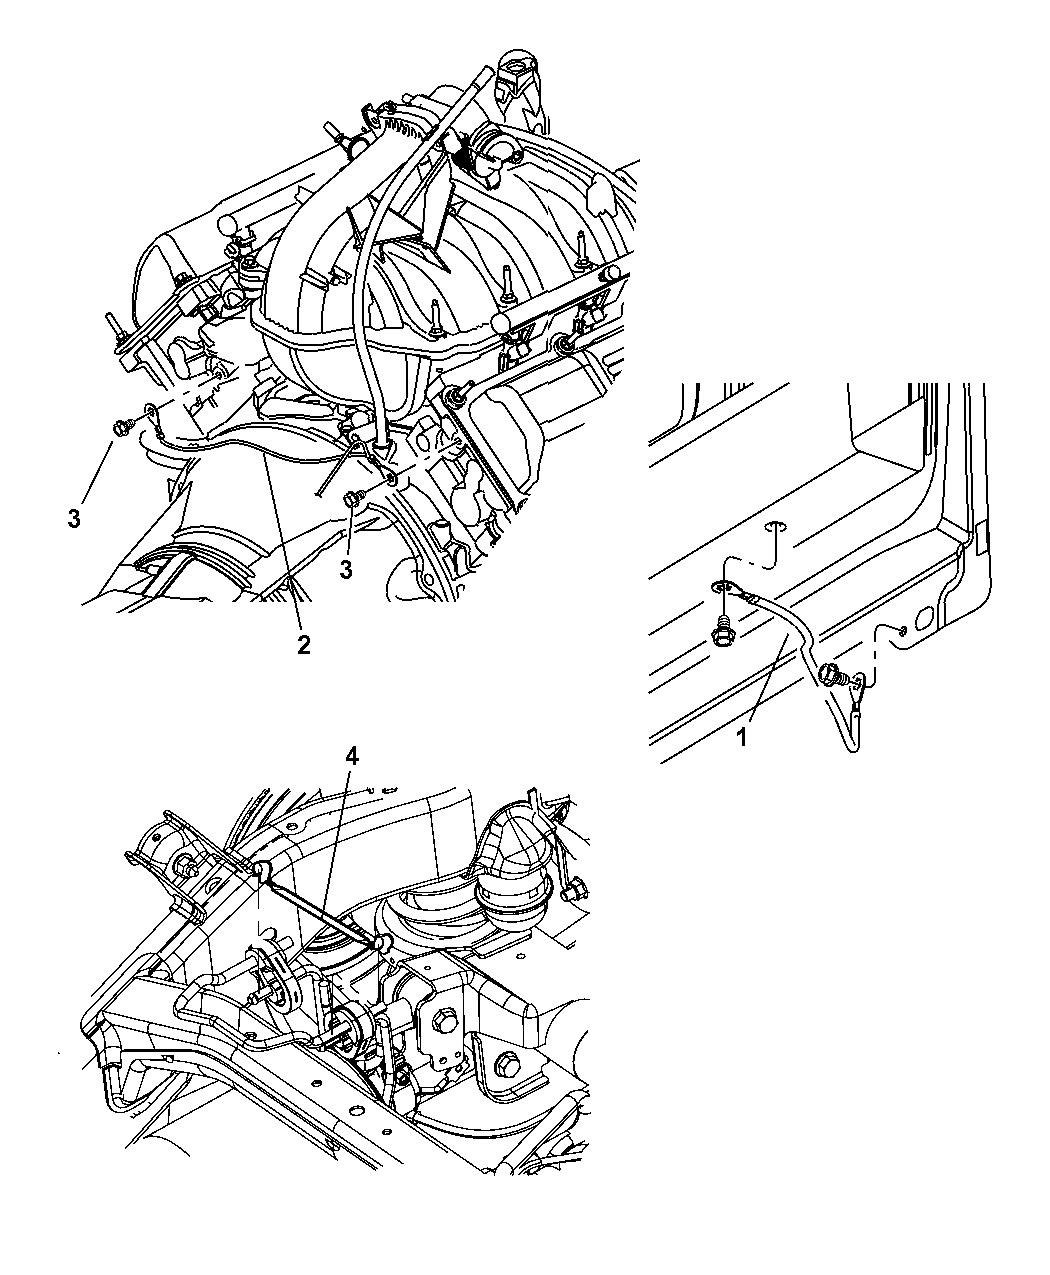 2009 dodge hemi engine diagrams